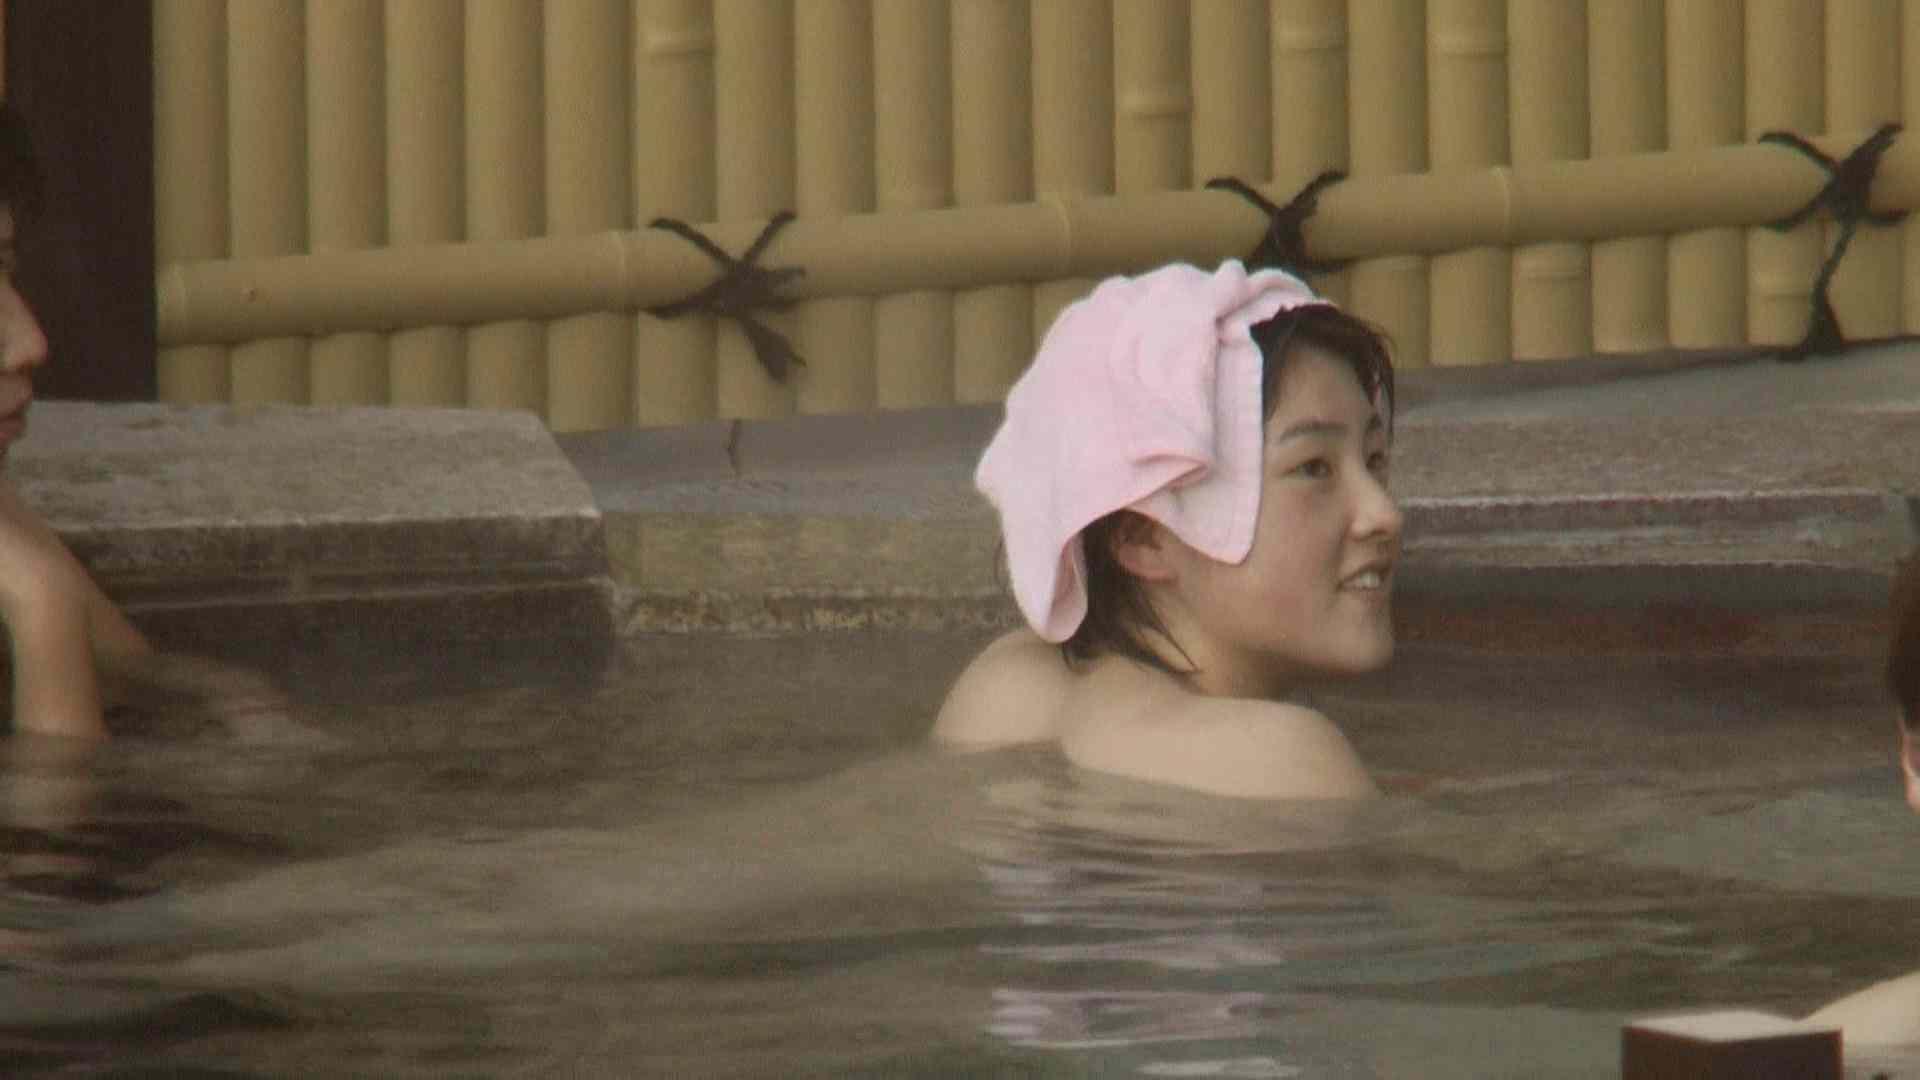 Aquaな露天風呂Vol.207 露天風呂編 | 盗撮シリーズ  109PIX 109